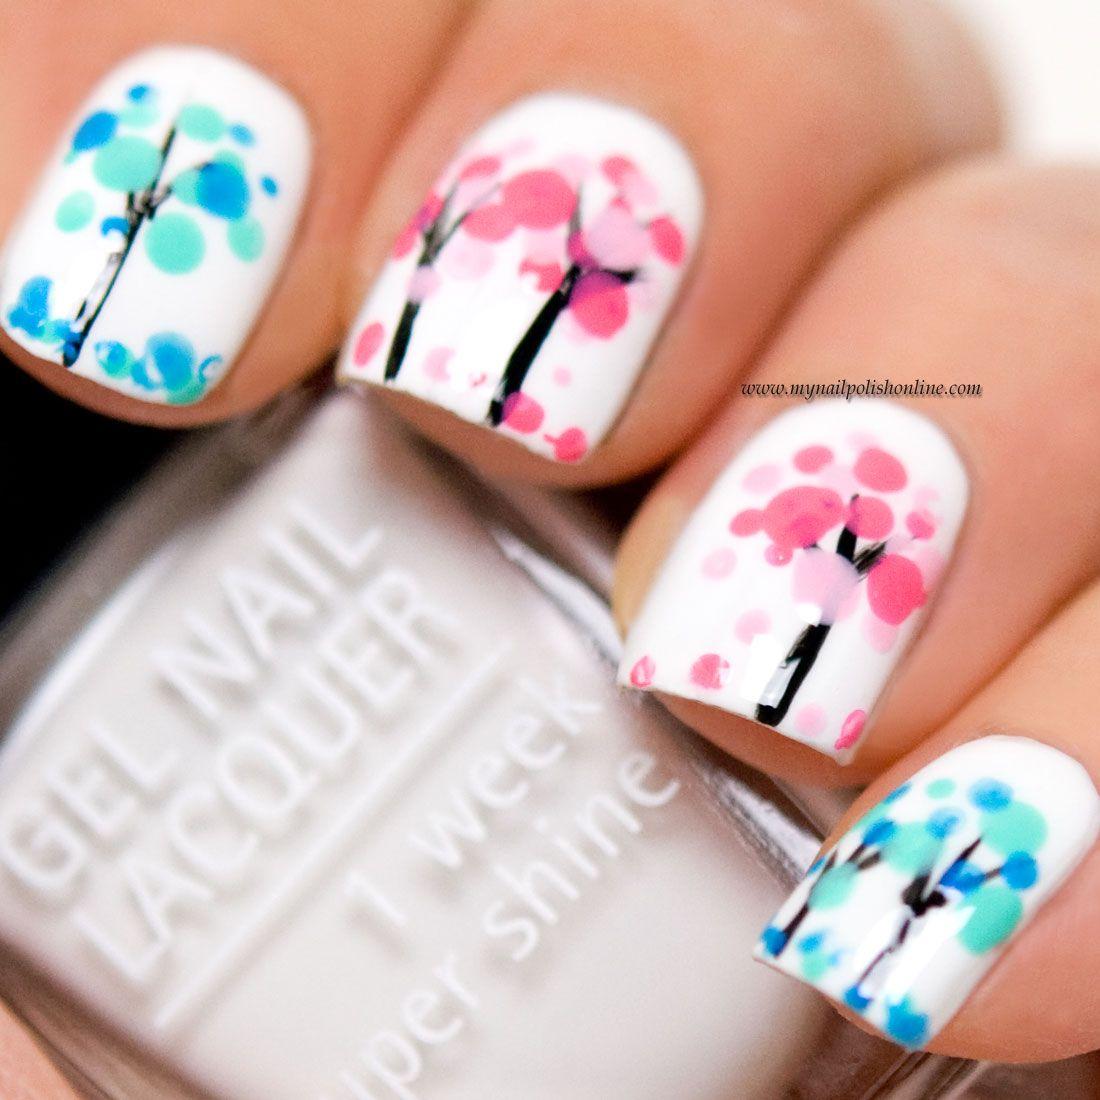 Nail Art – Blooming Trees (My Nail Polish Online) | Baum, Muster und ...